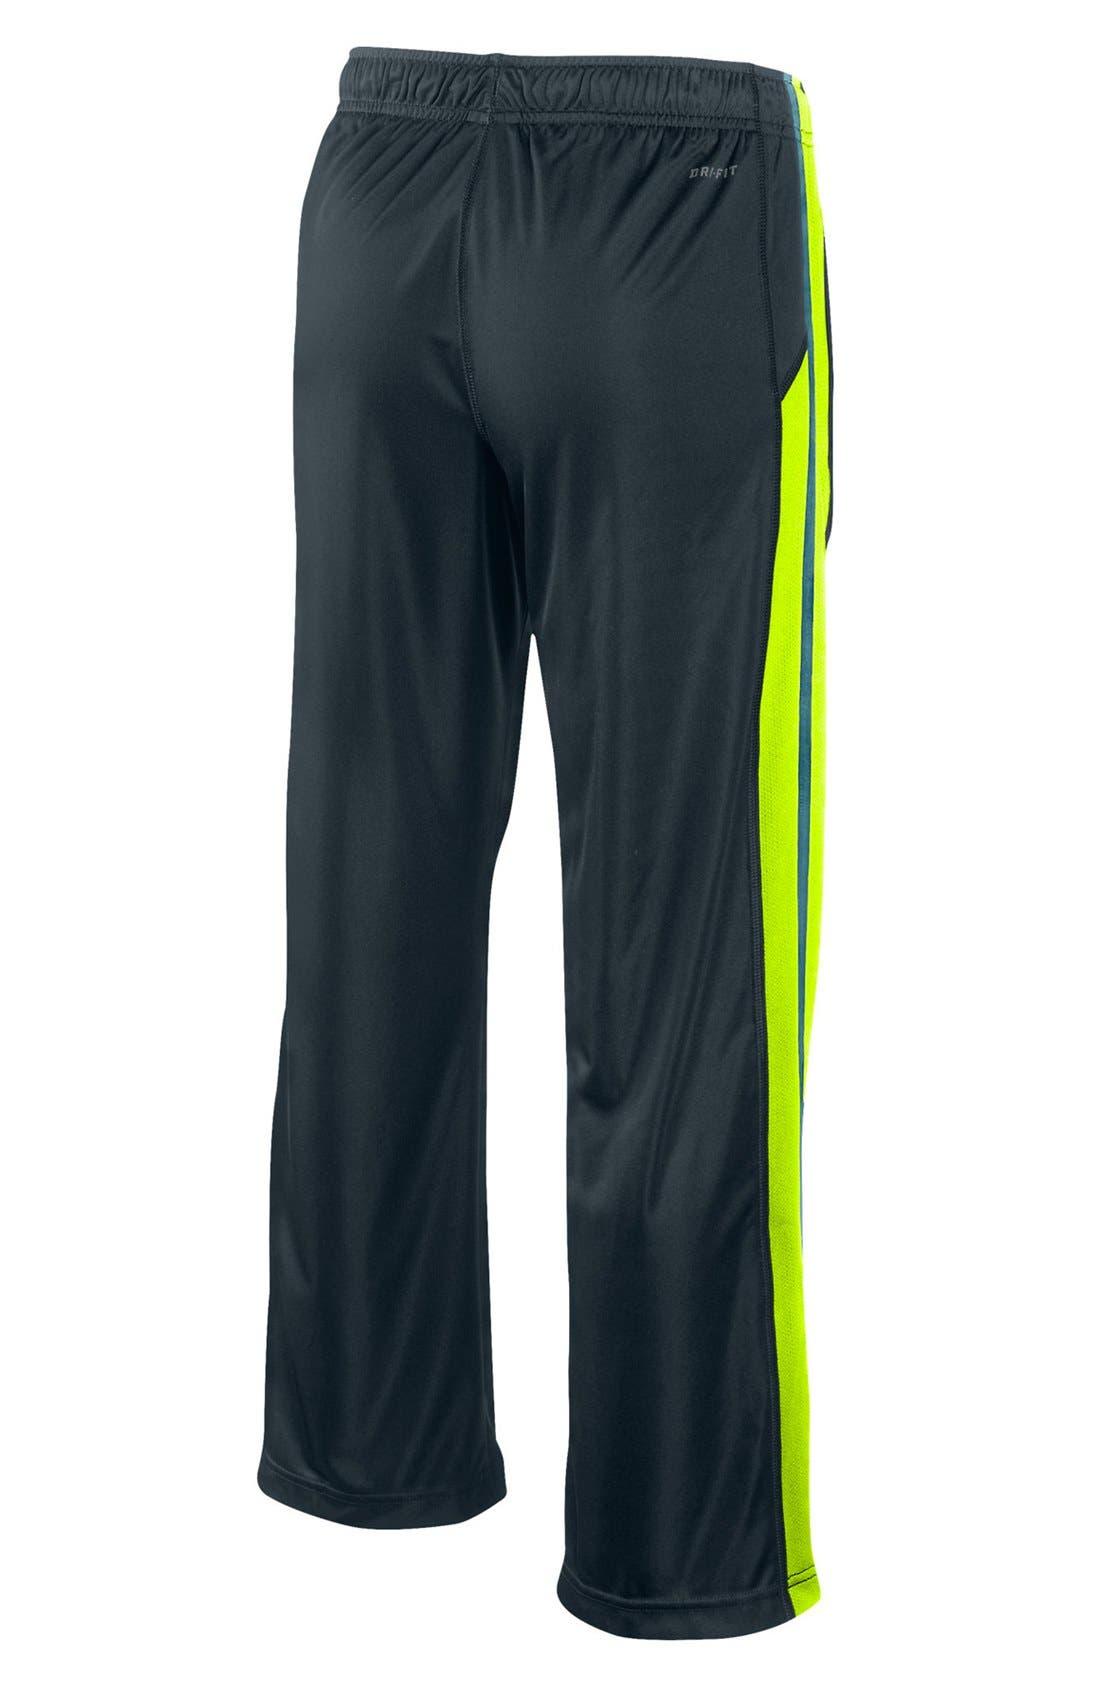 Alternate Image 2  - Nike 'Lights Out' Pants (Big Boys)